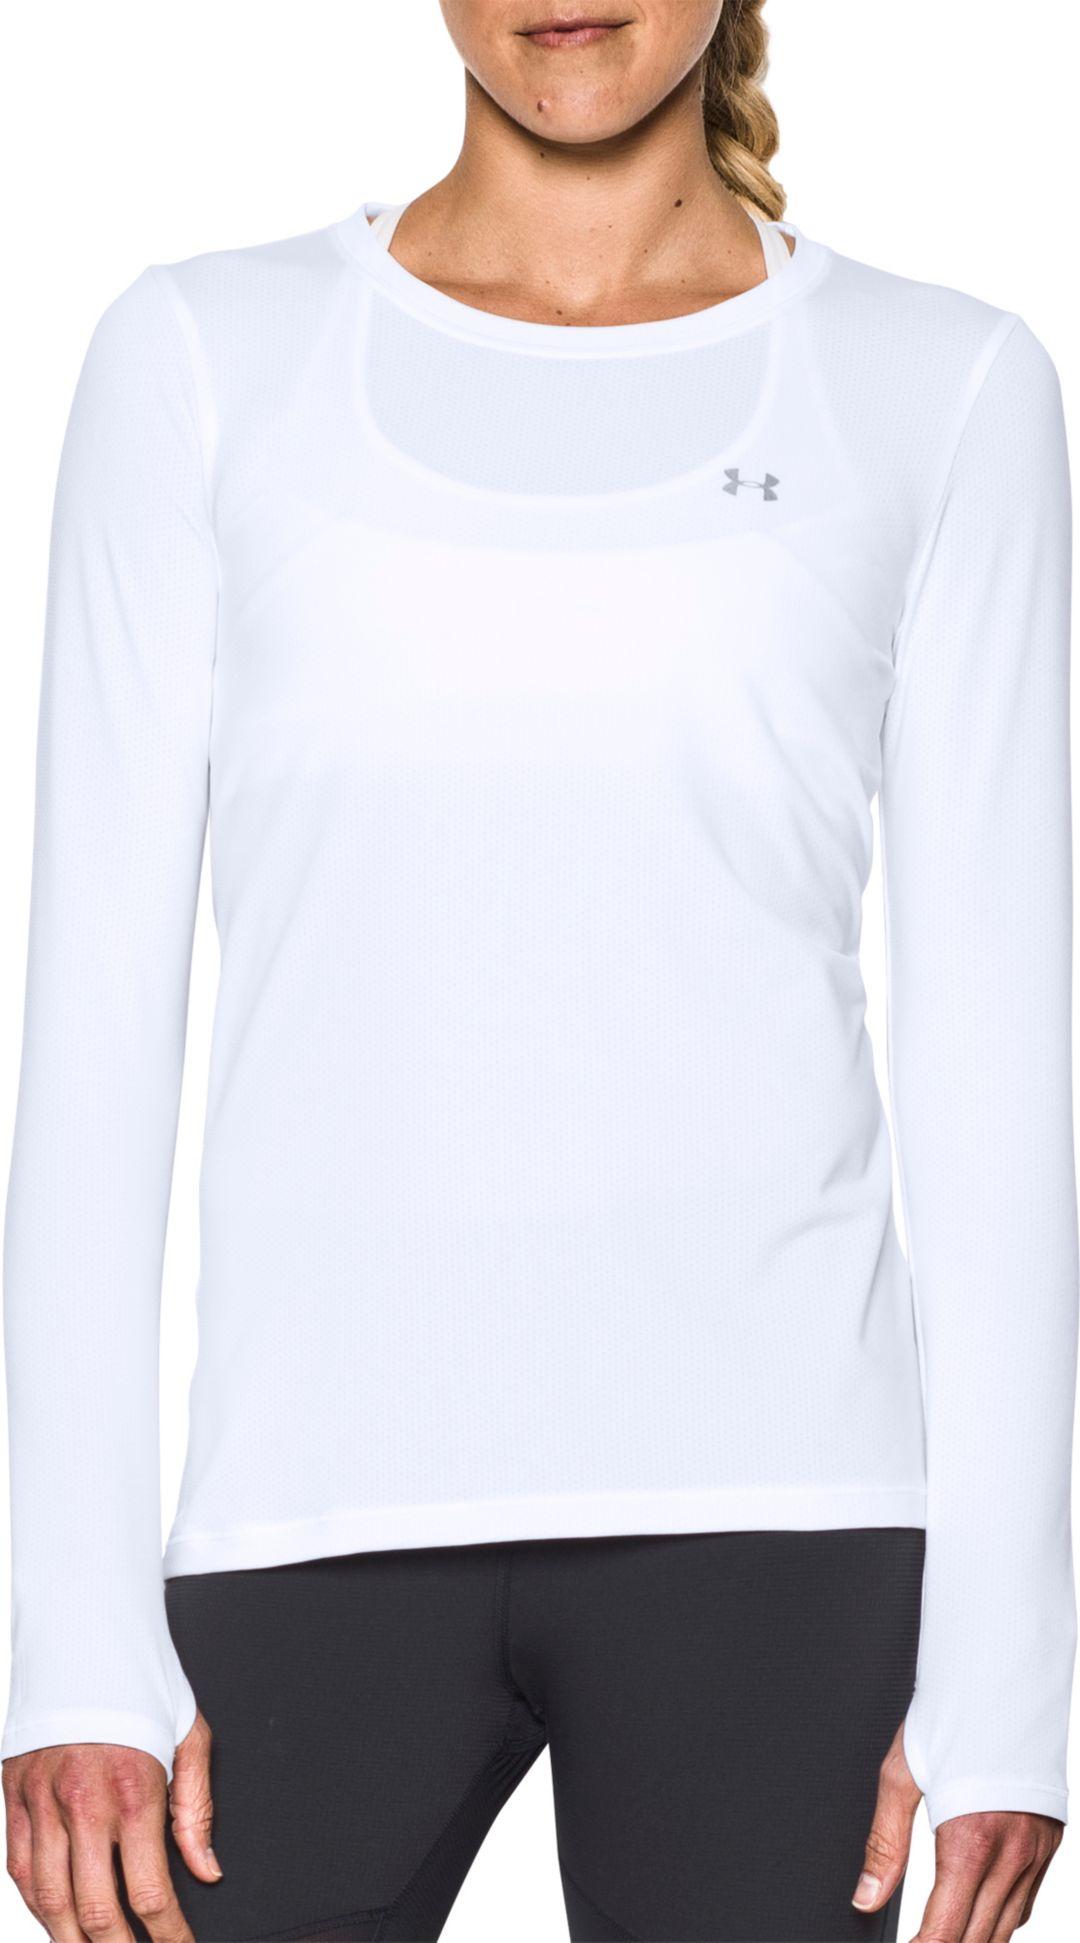 95dbb295 Under Armour Women's HeatGear Armour Long Sleeve Shirt | DICK'S ...